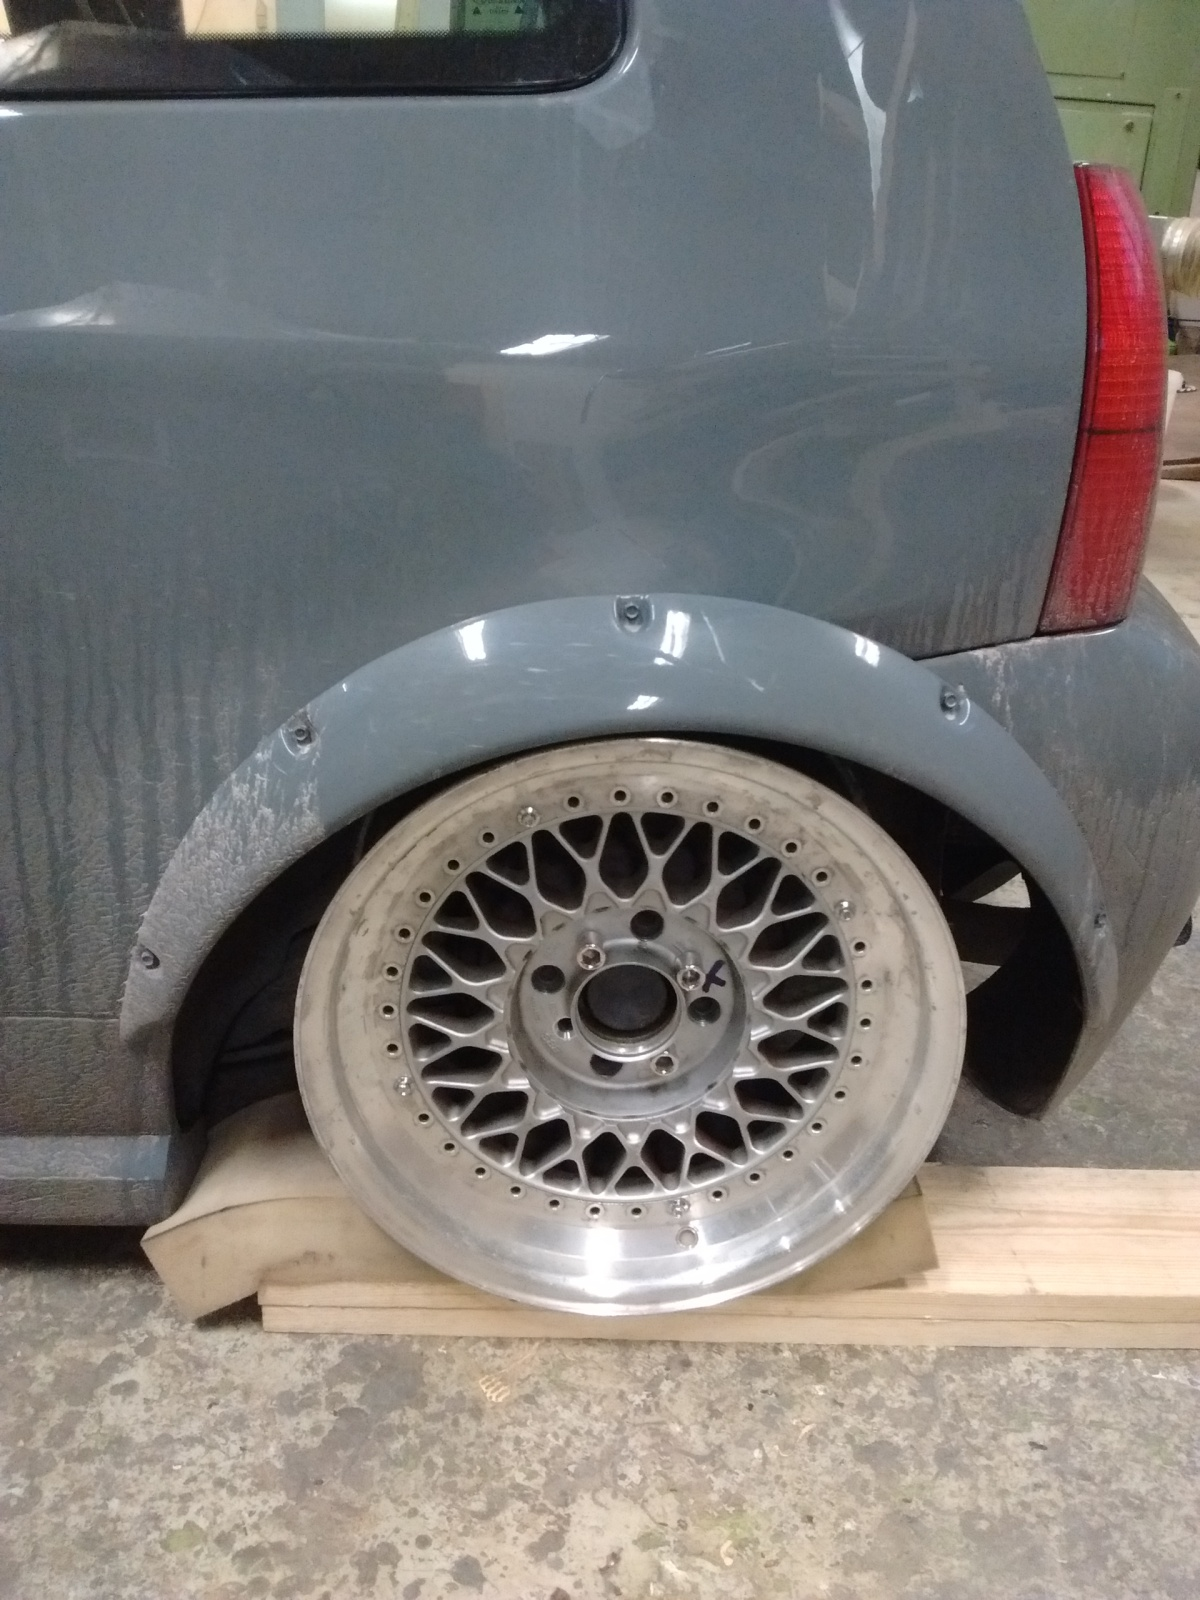 Wheelback: Baby Bender - Lupo - Sivu 7 1jvm7k